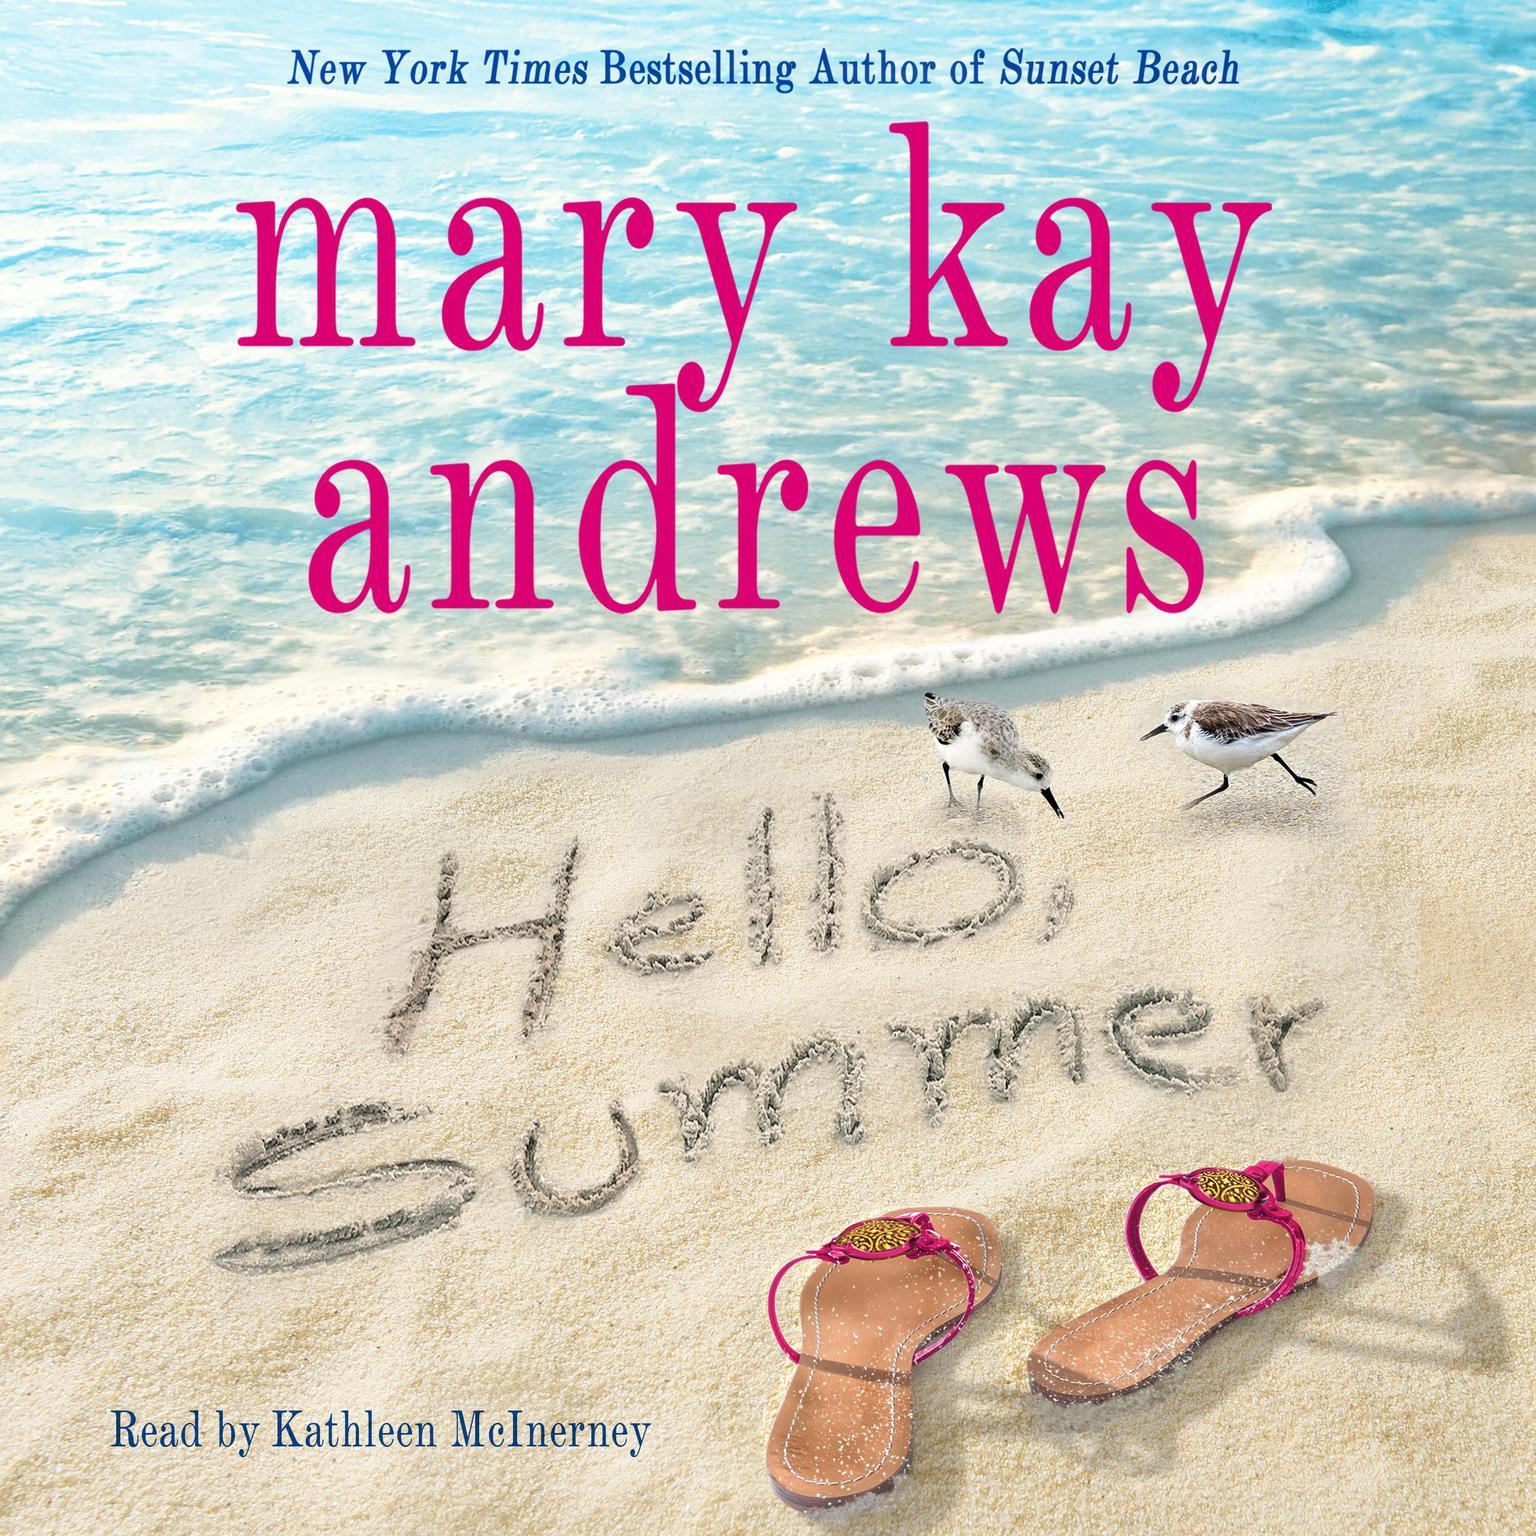 Hello, Summer: A Novel Audiobook, by Mary Kay Andrews